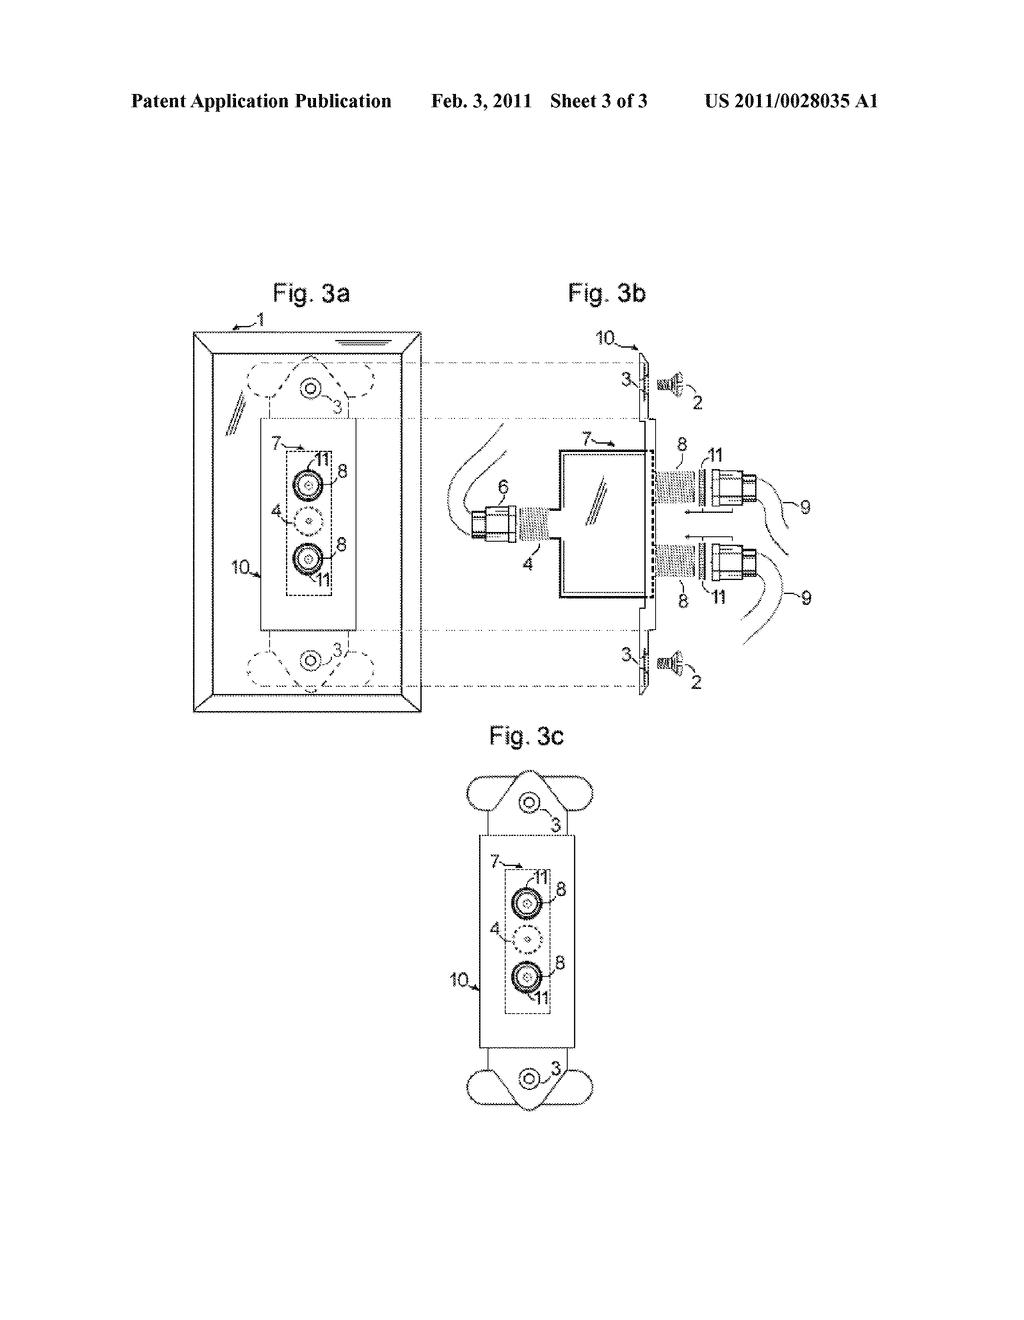 Tv Signal Splitter Wiring Diagram Data Schema Traffic Light Schematic Wall Plate Having Integrated Catv Photocell